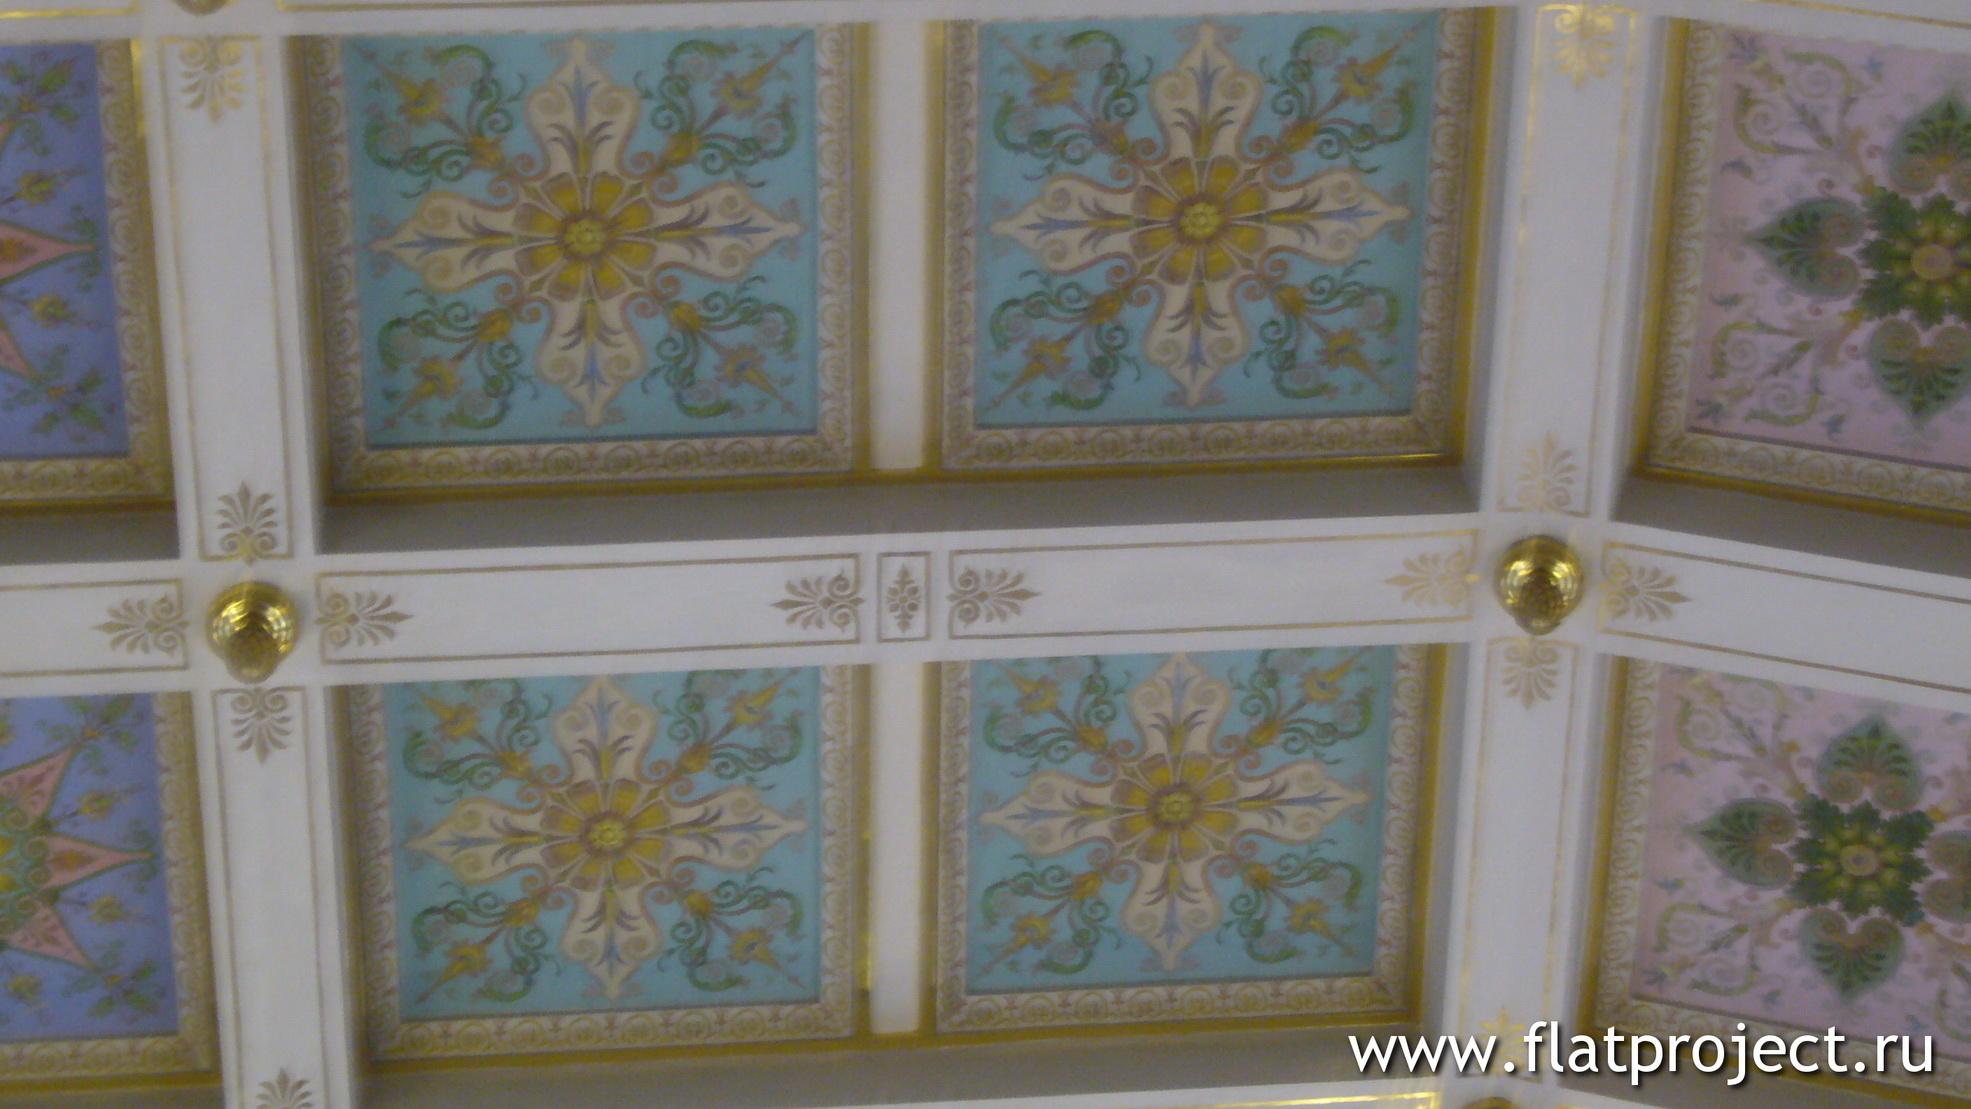 The State Hermitage museum interiors – photo 123